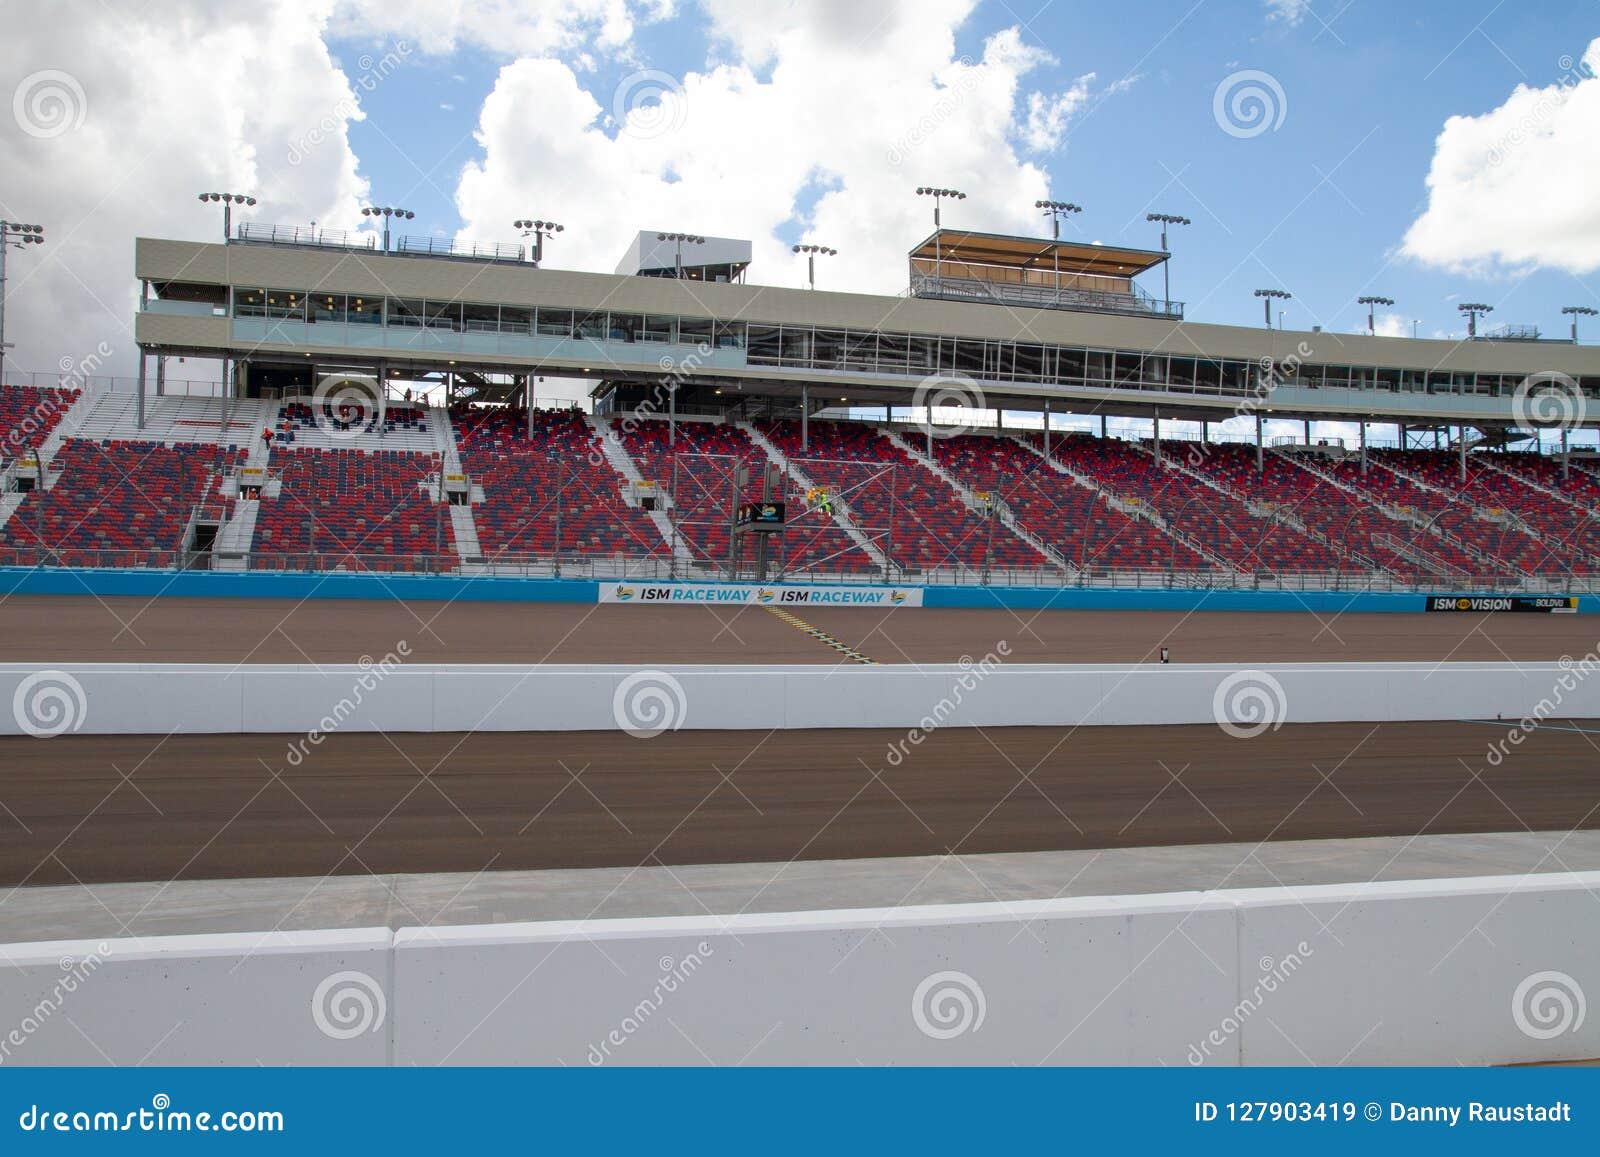 ISM Raceway - Phoenix Nascar and IndyCar